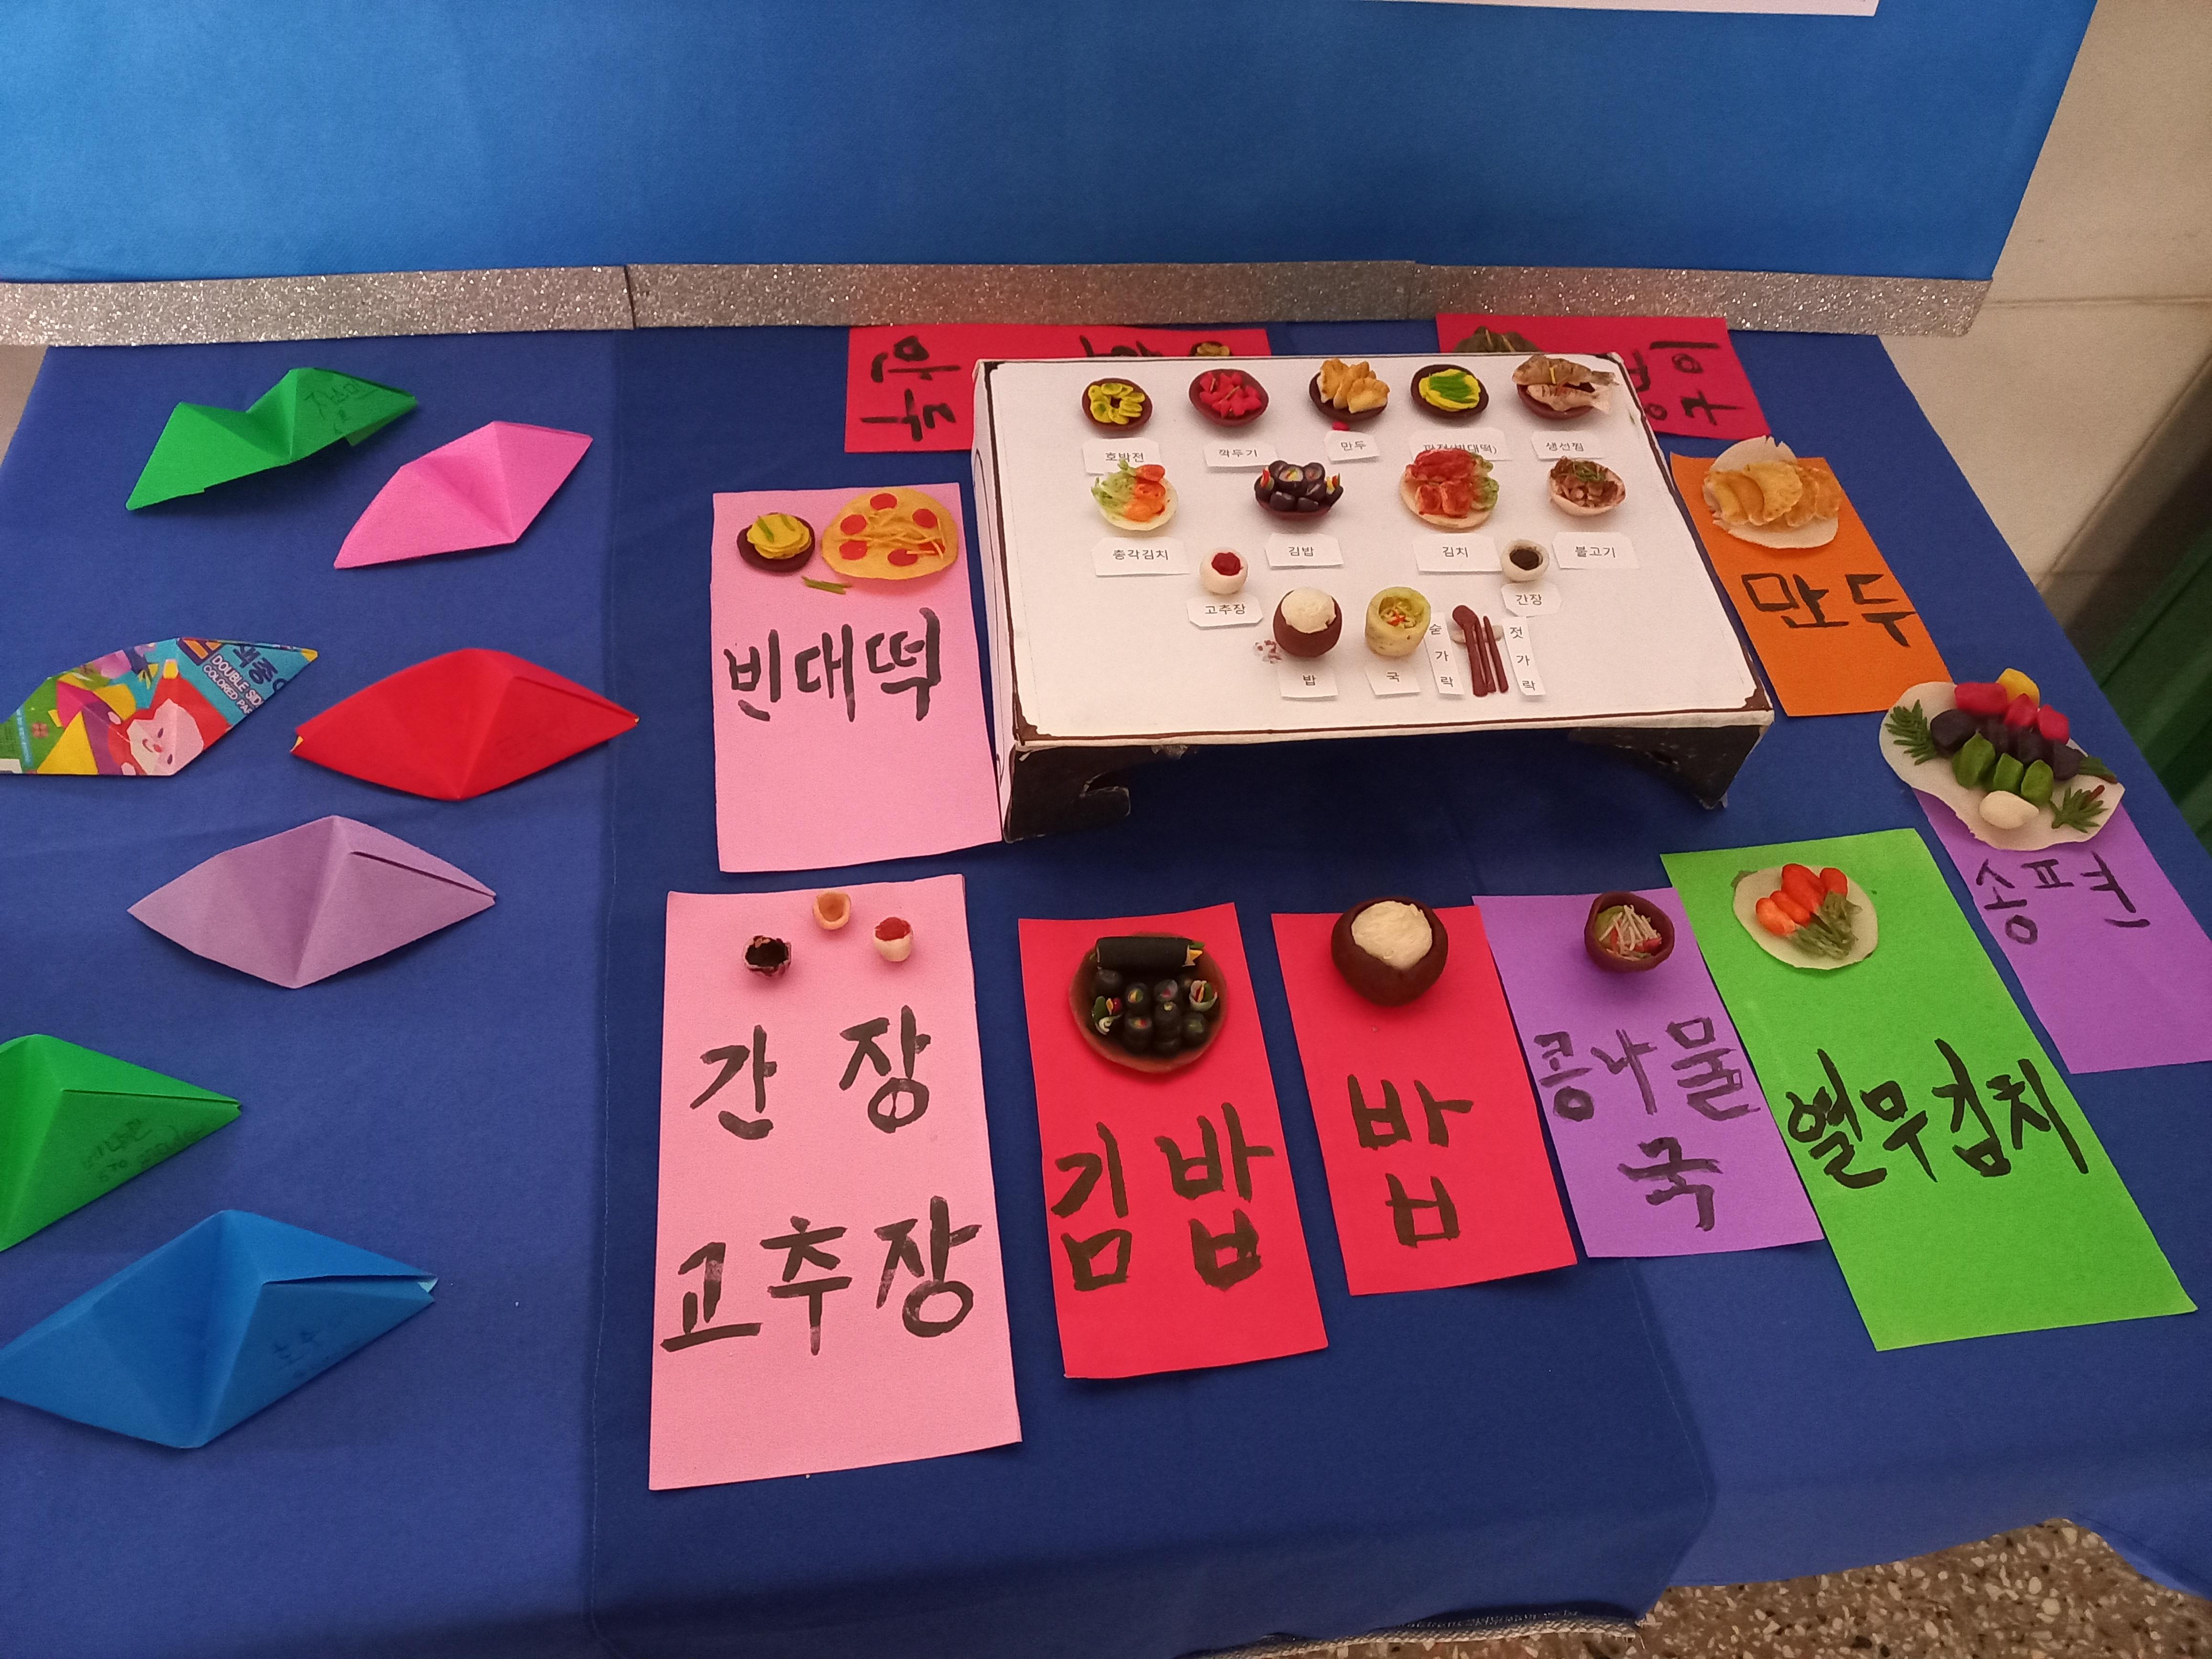 Presentacion de Maria 초중고등학교방문 (23).jpg